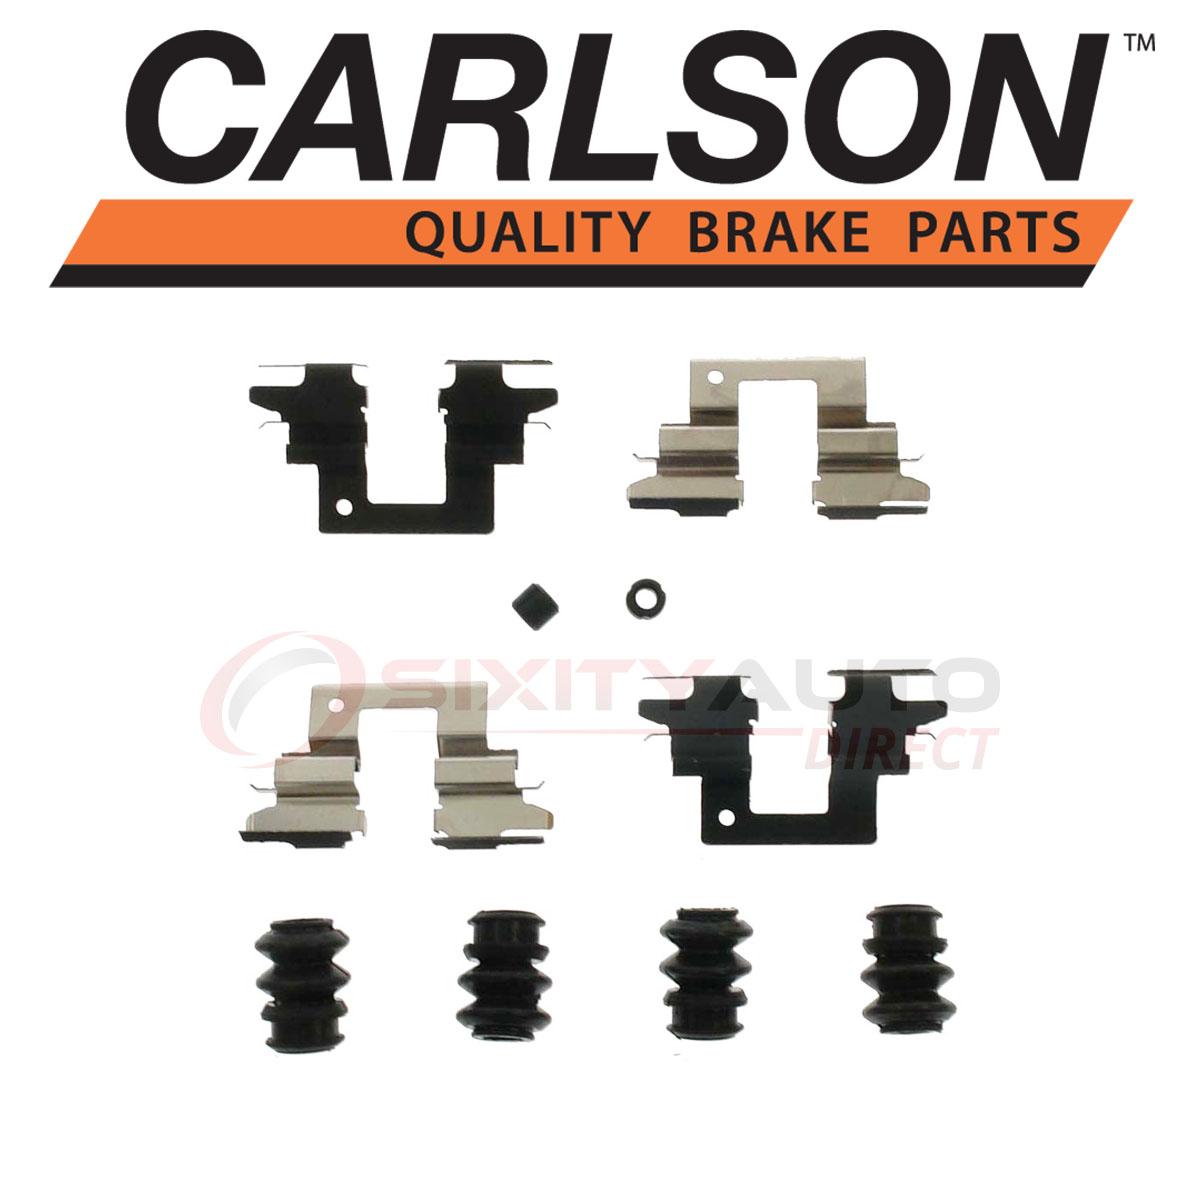 Carlson Rear Disc Brake Hardware Kit for 2001-2006 Acura ...